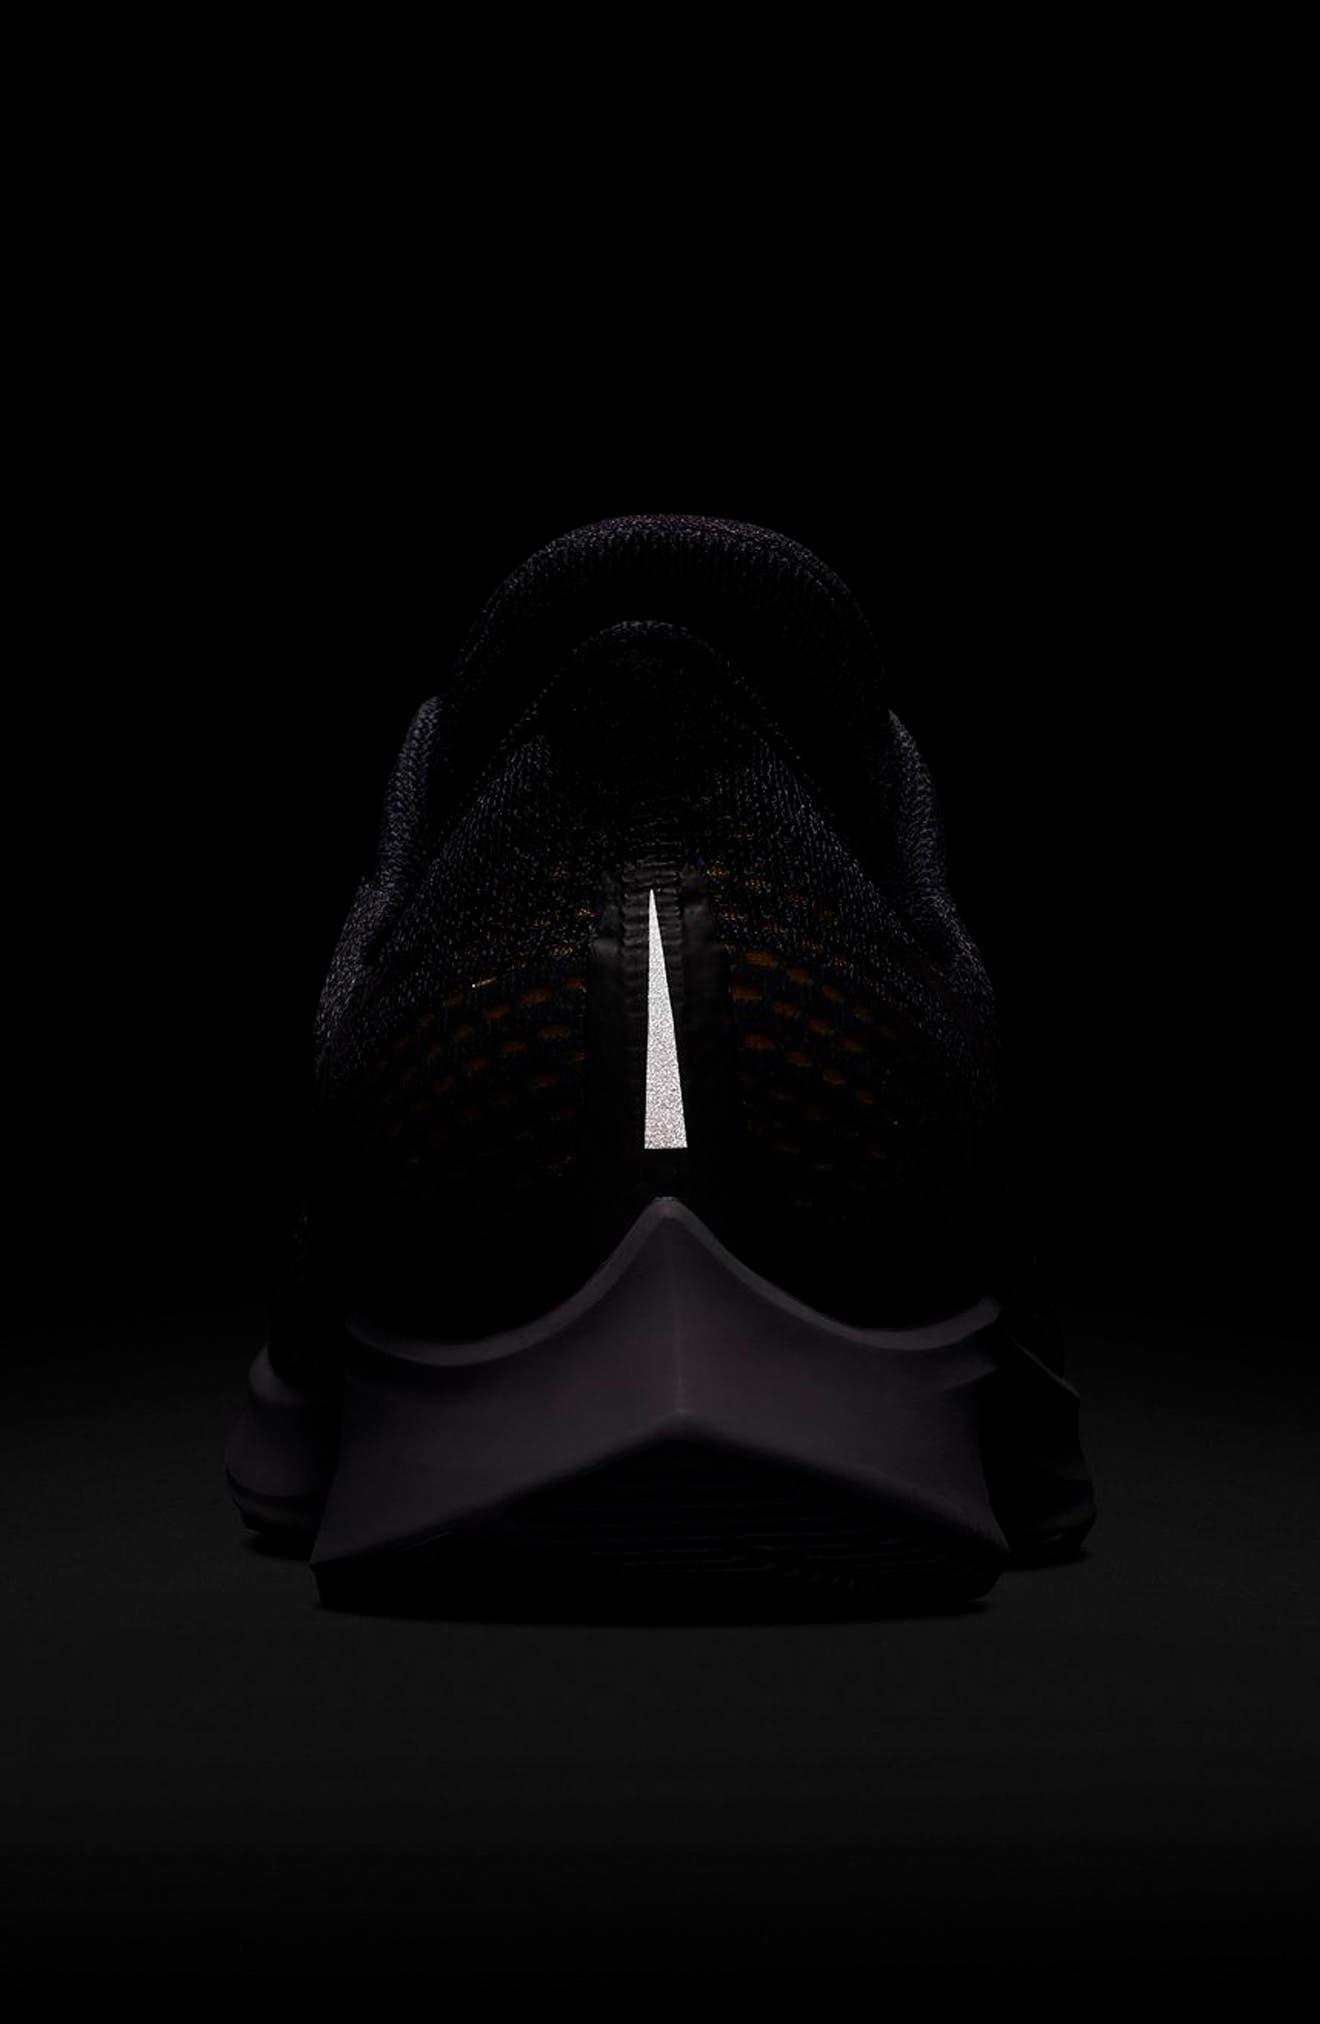 Air Zoom Pegasus 35 Running Shoe,                             Alternate thumbnail 6, color,                             BLACK/ PEWTER/ MOSS